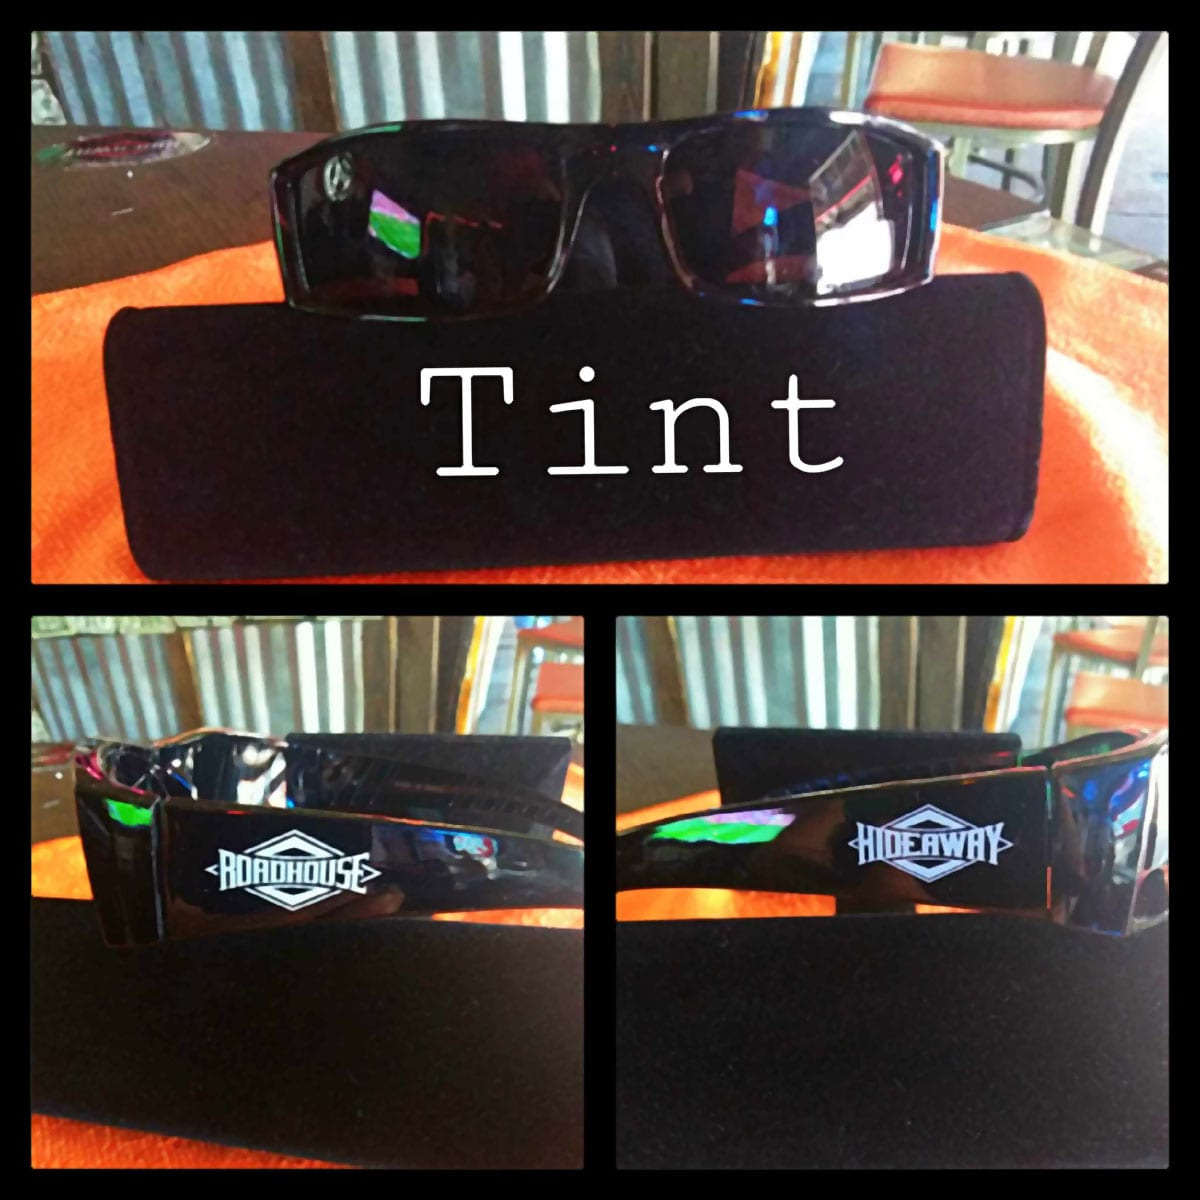 Roadhouse / Hideaway Glasses - Tinted Lenses